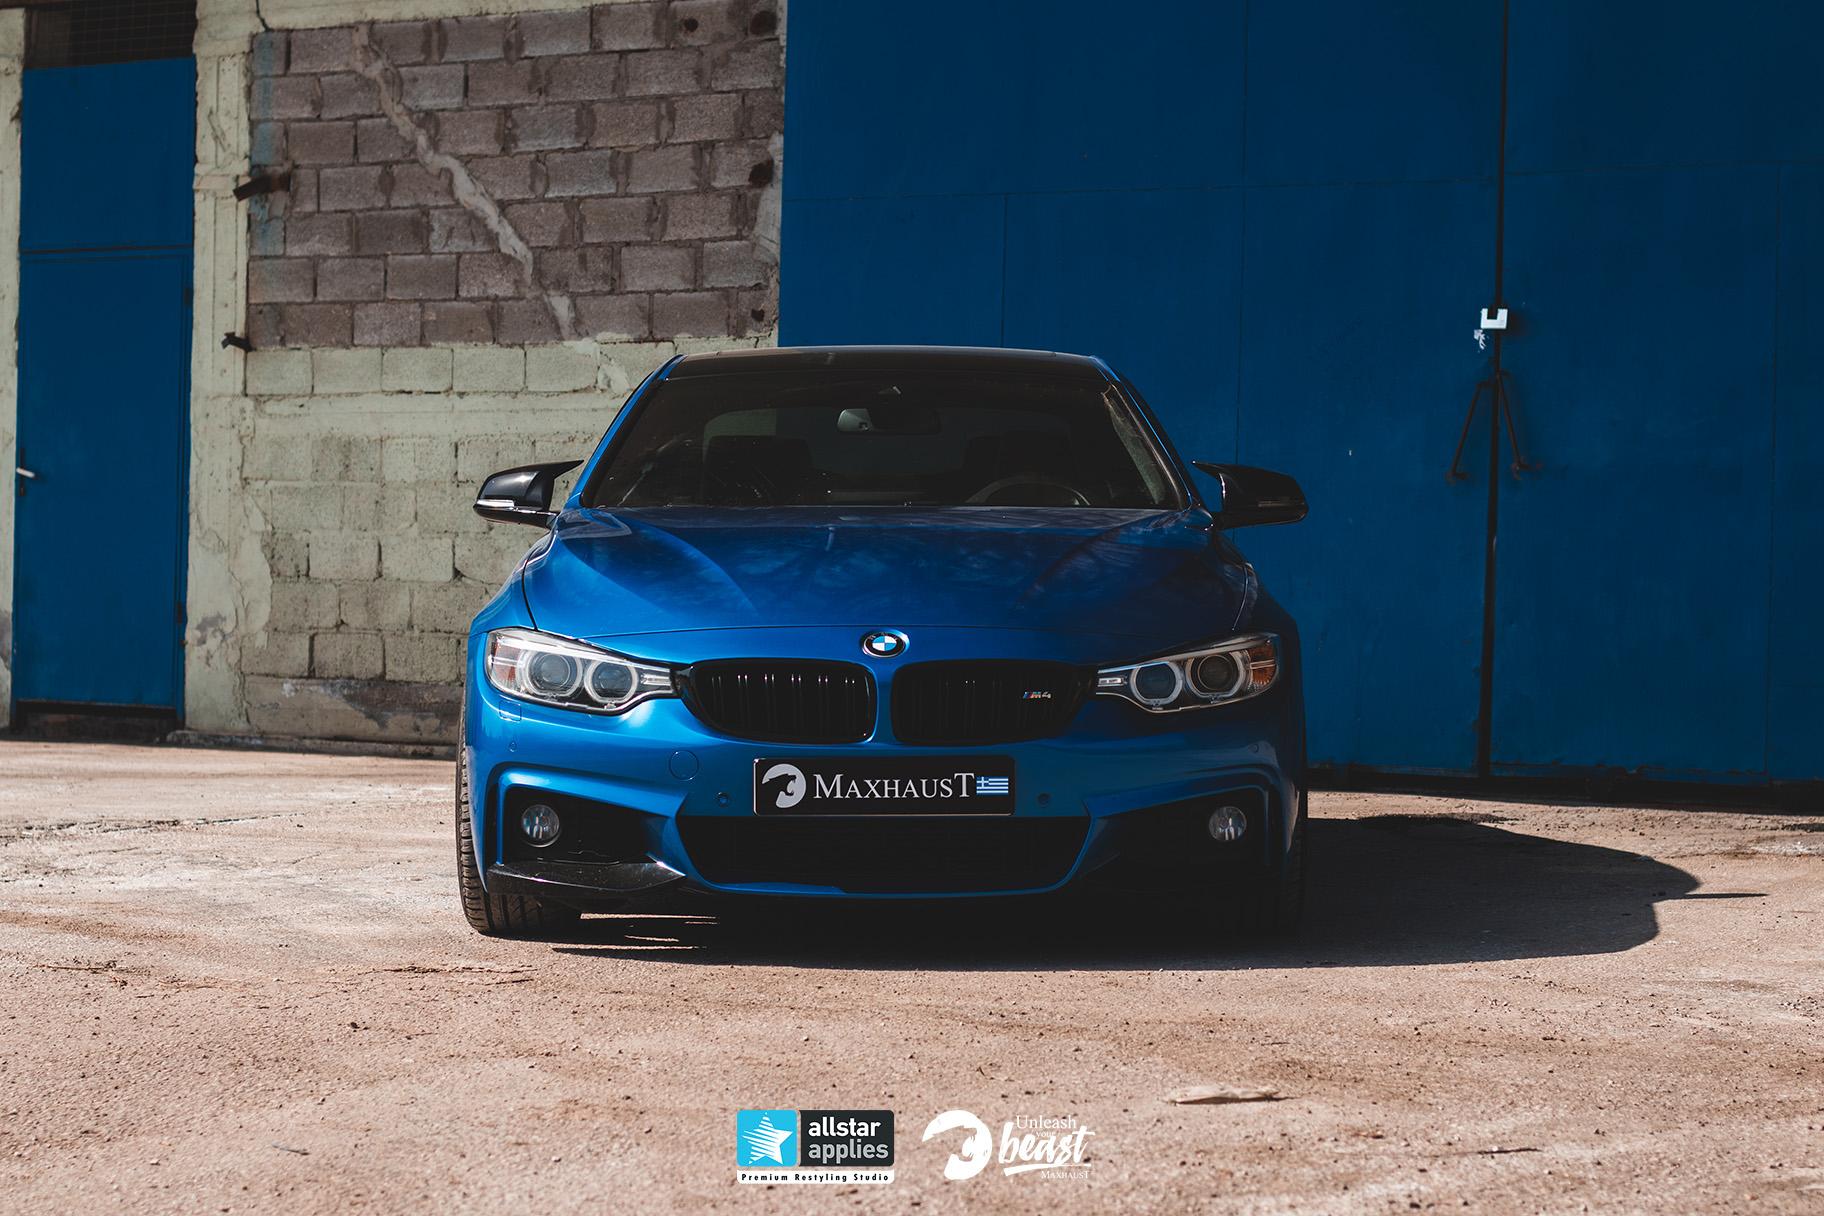 BMW MAXHAUST M4 3